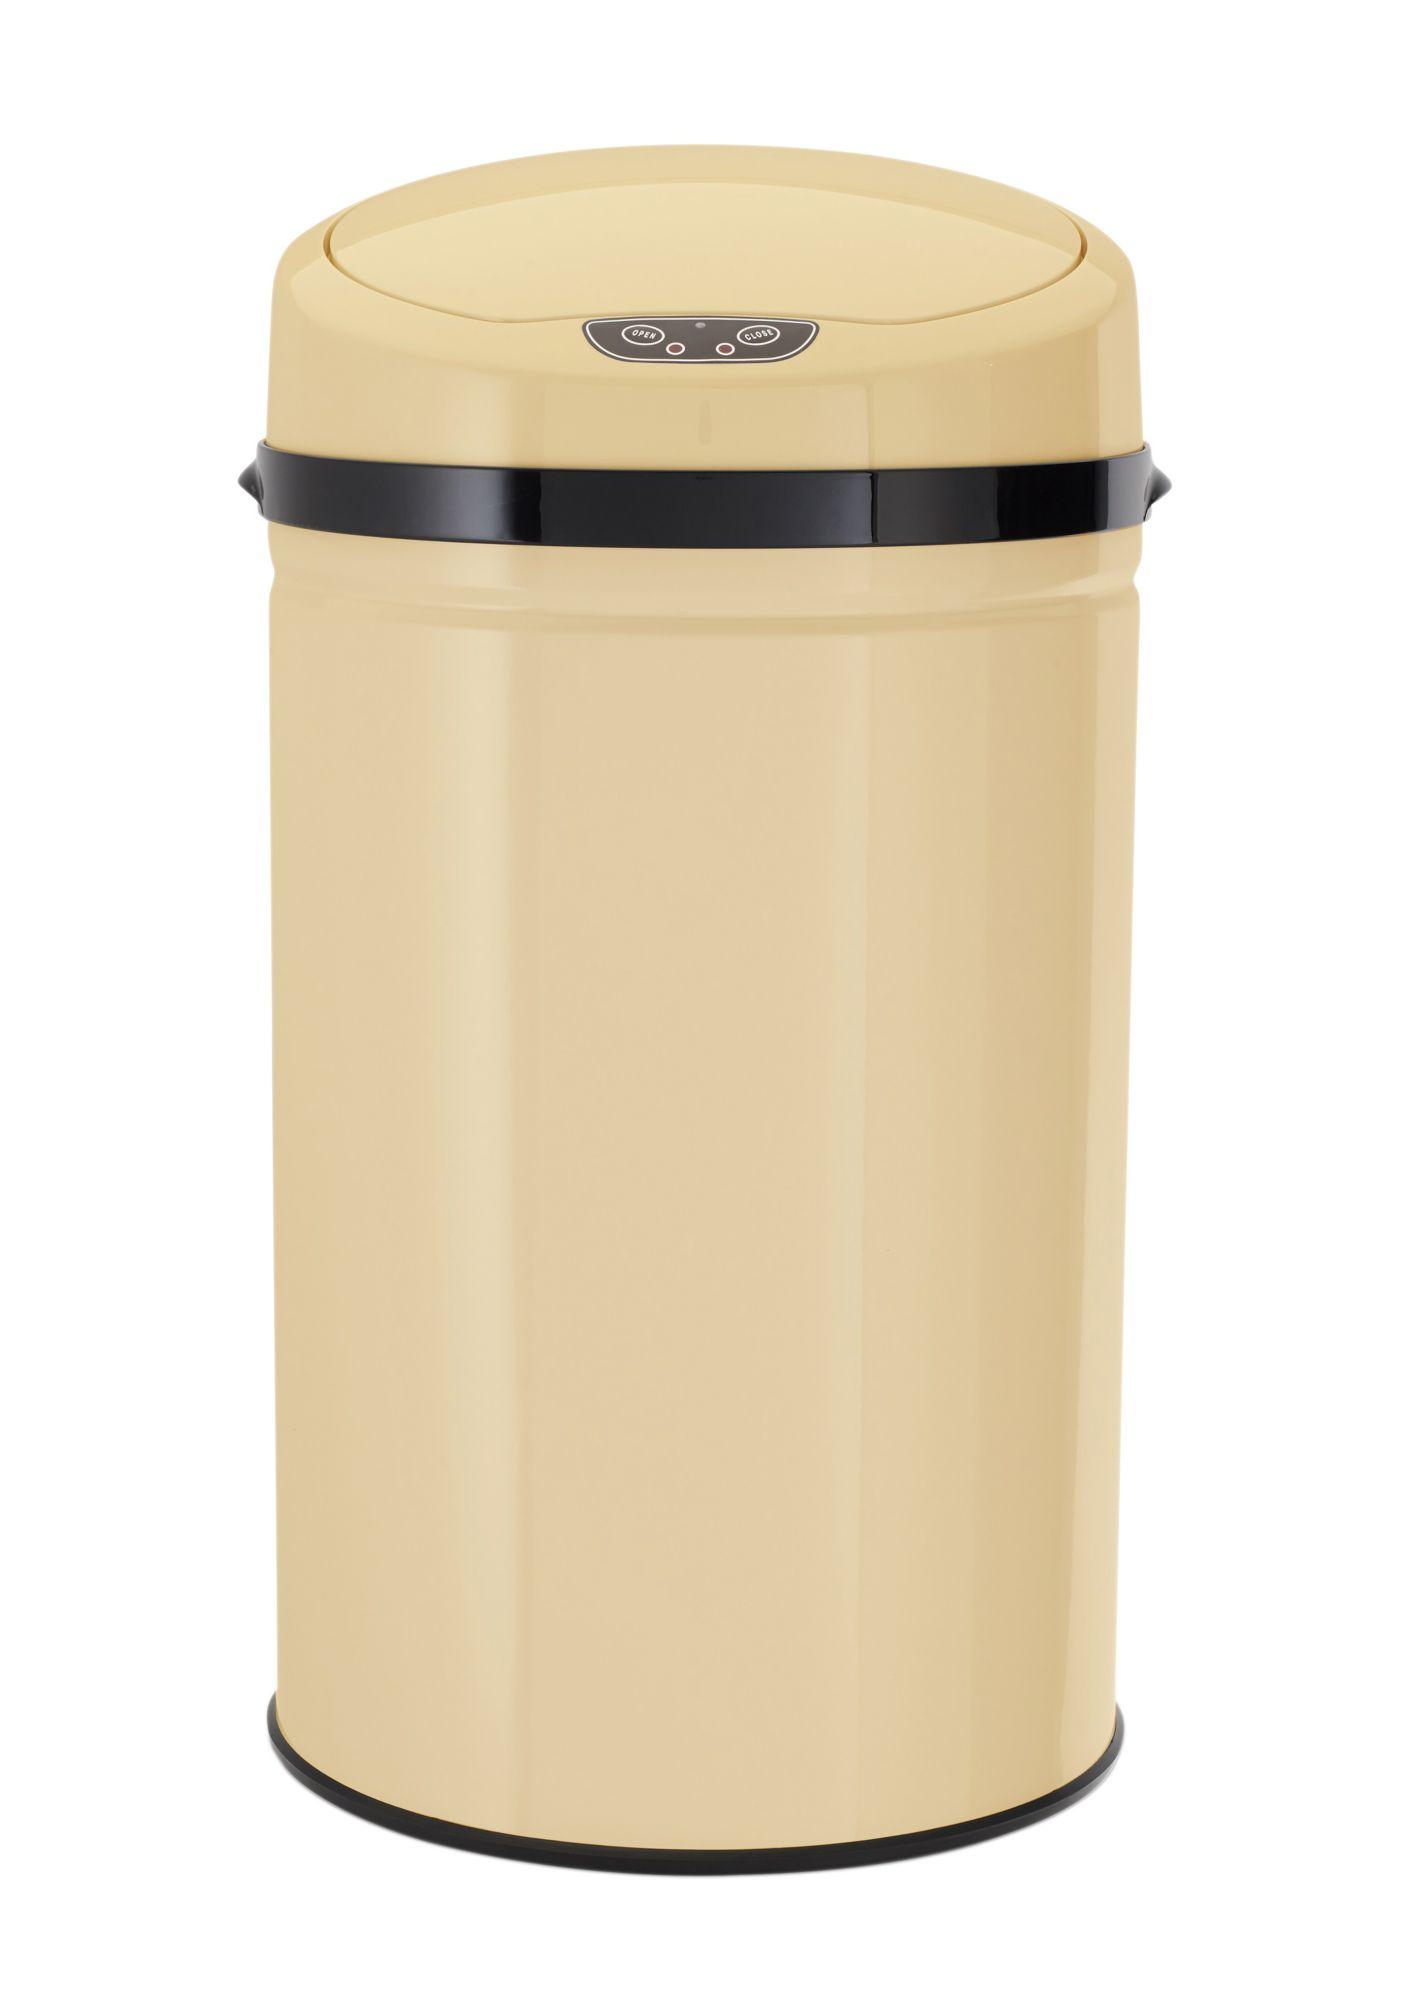 ECHTWERK Edelstahl-Abfalleimer mit Infrarotsensor, 30 Liter, »INOX VANILLA«, Echtwerk